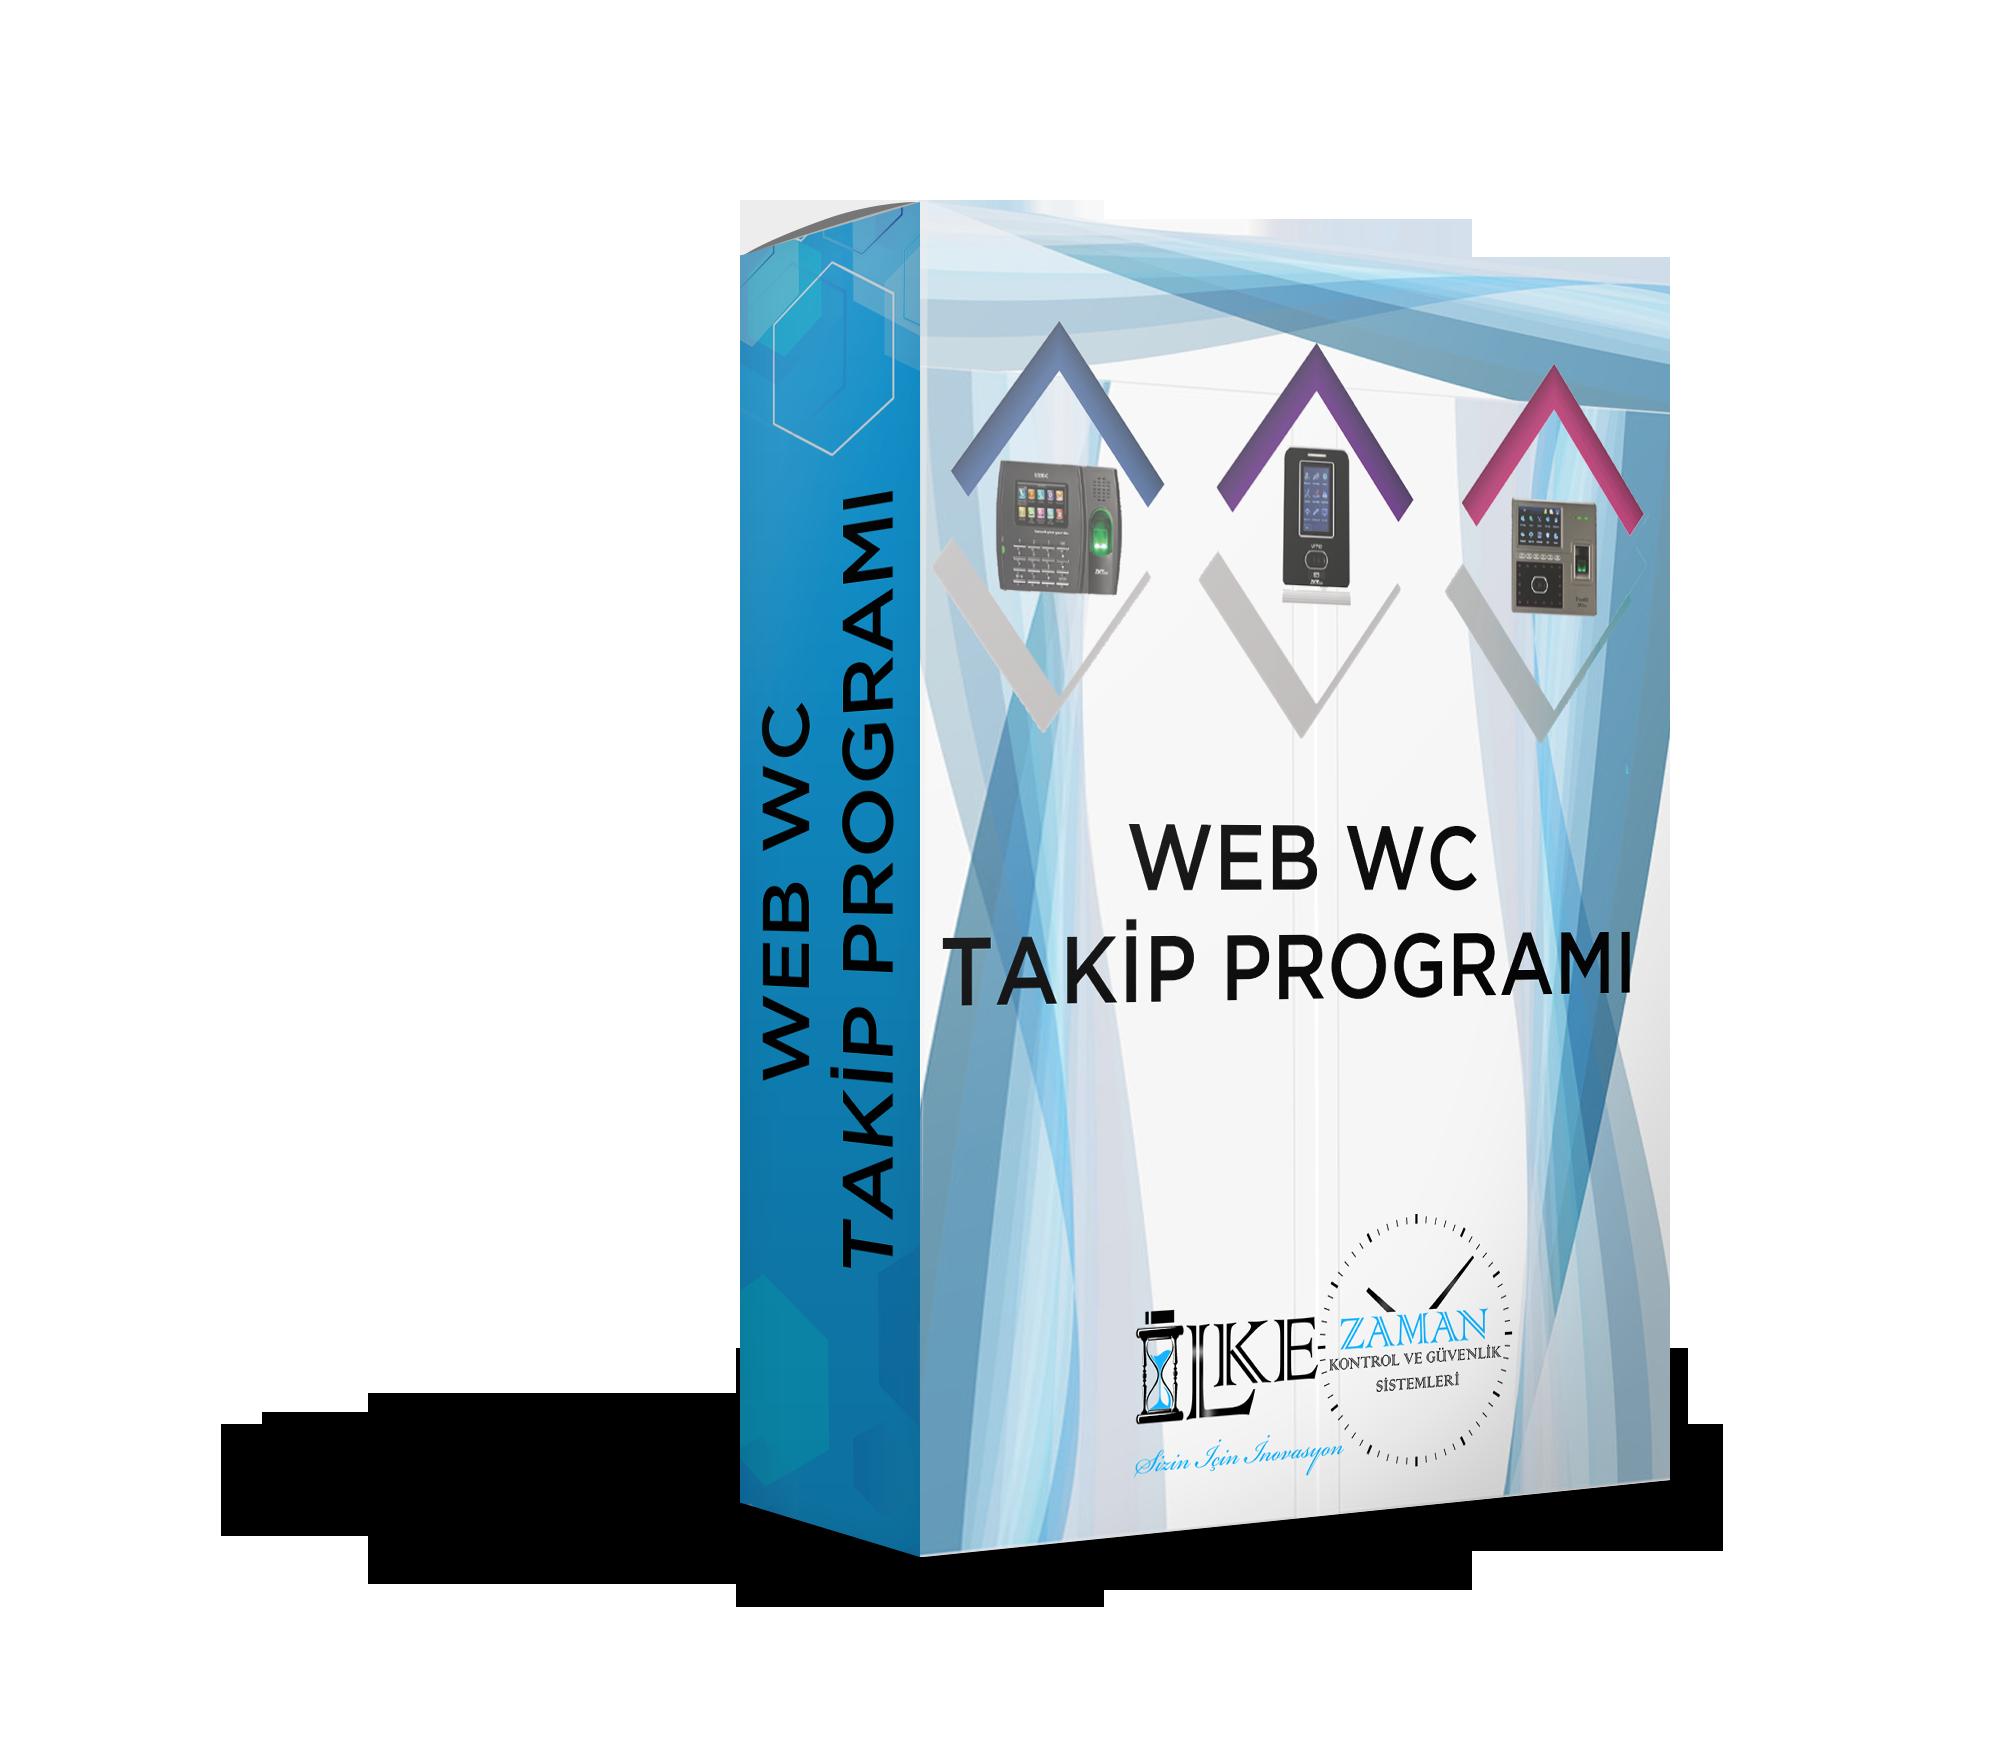 Web WC Takip Programı